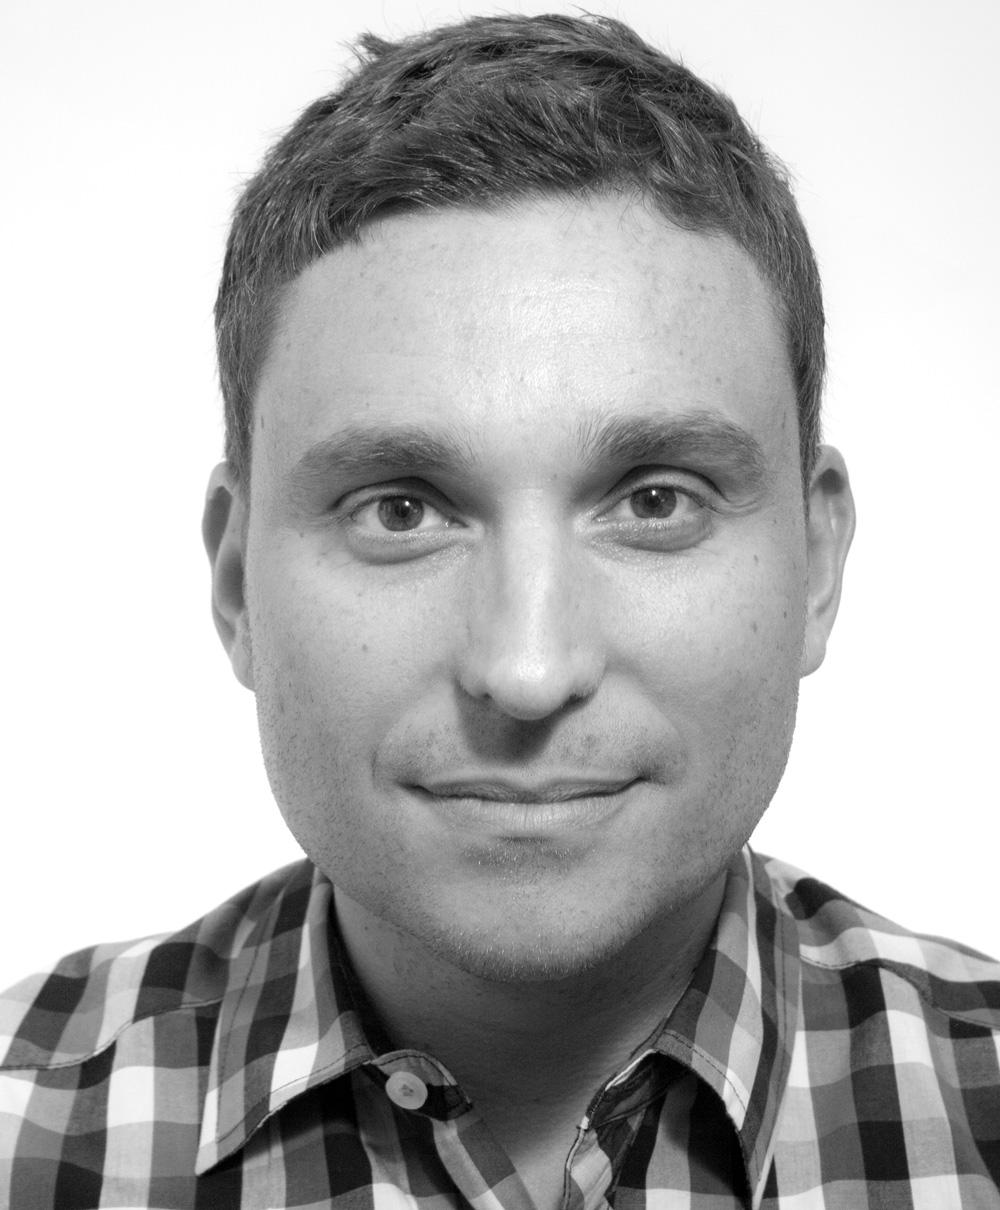 Headshot of Tom Tsaktsiris